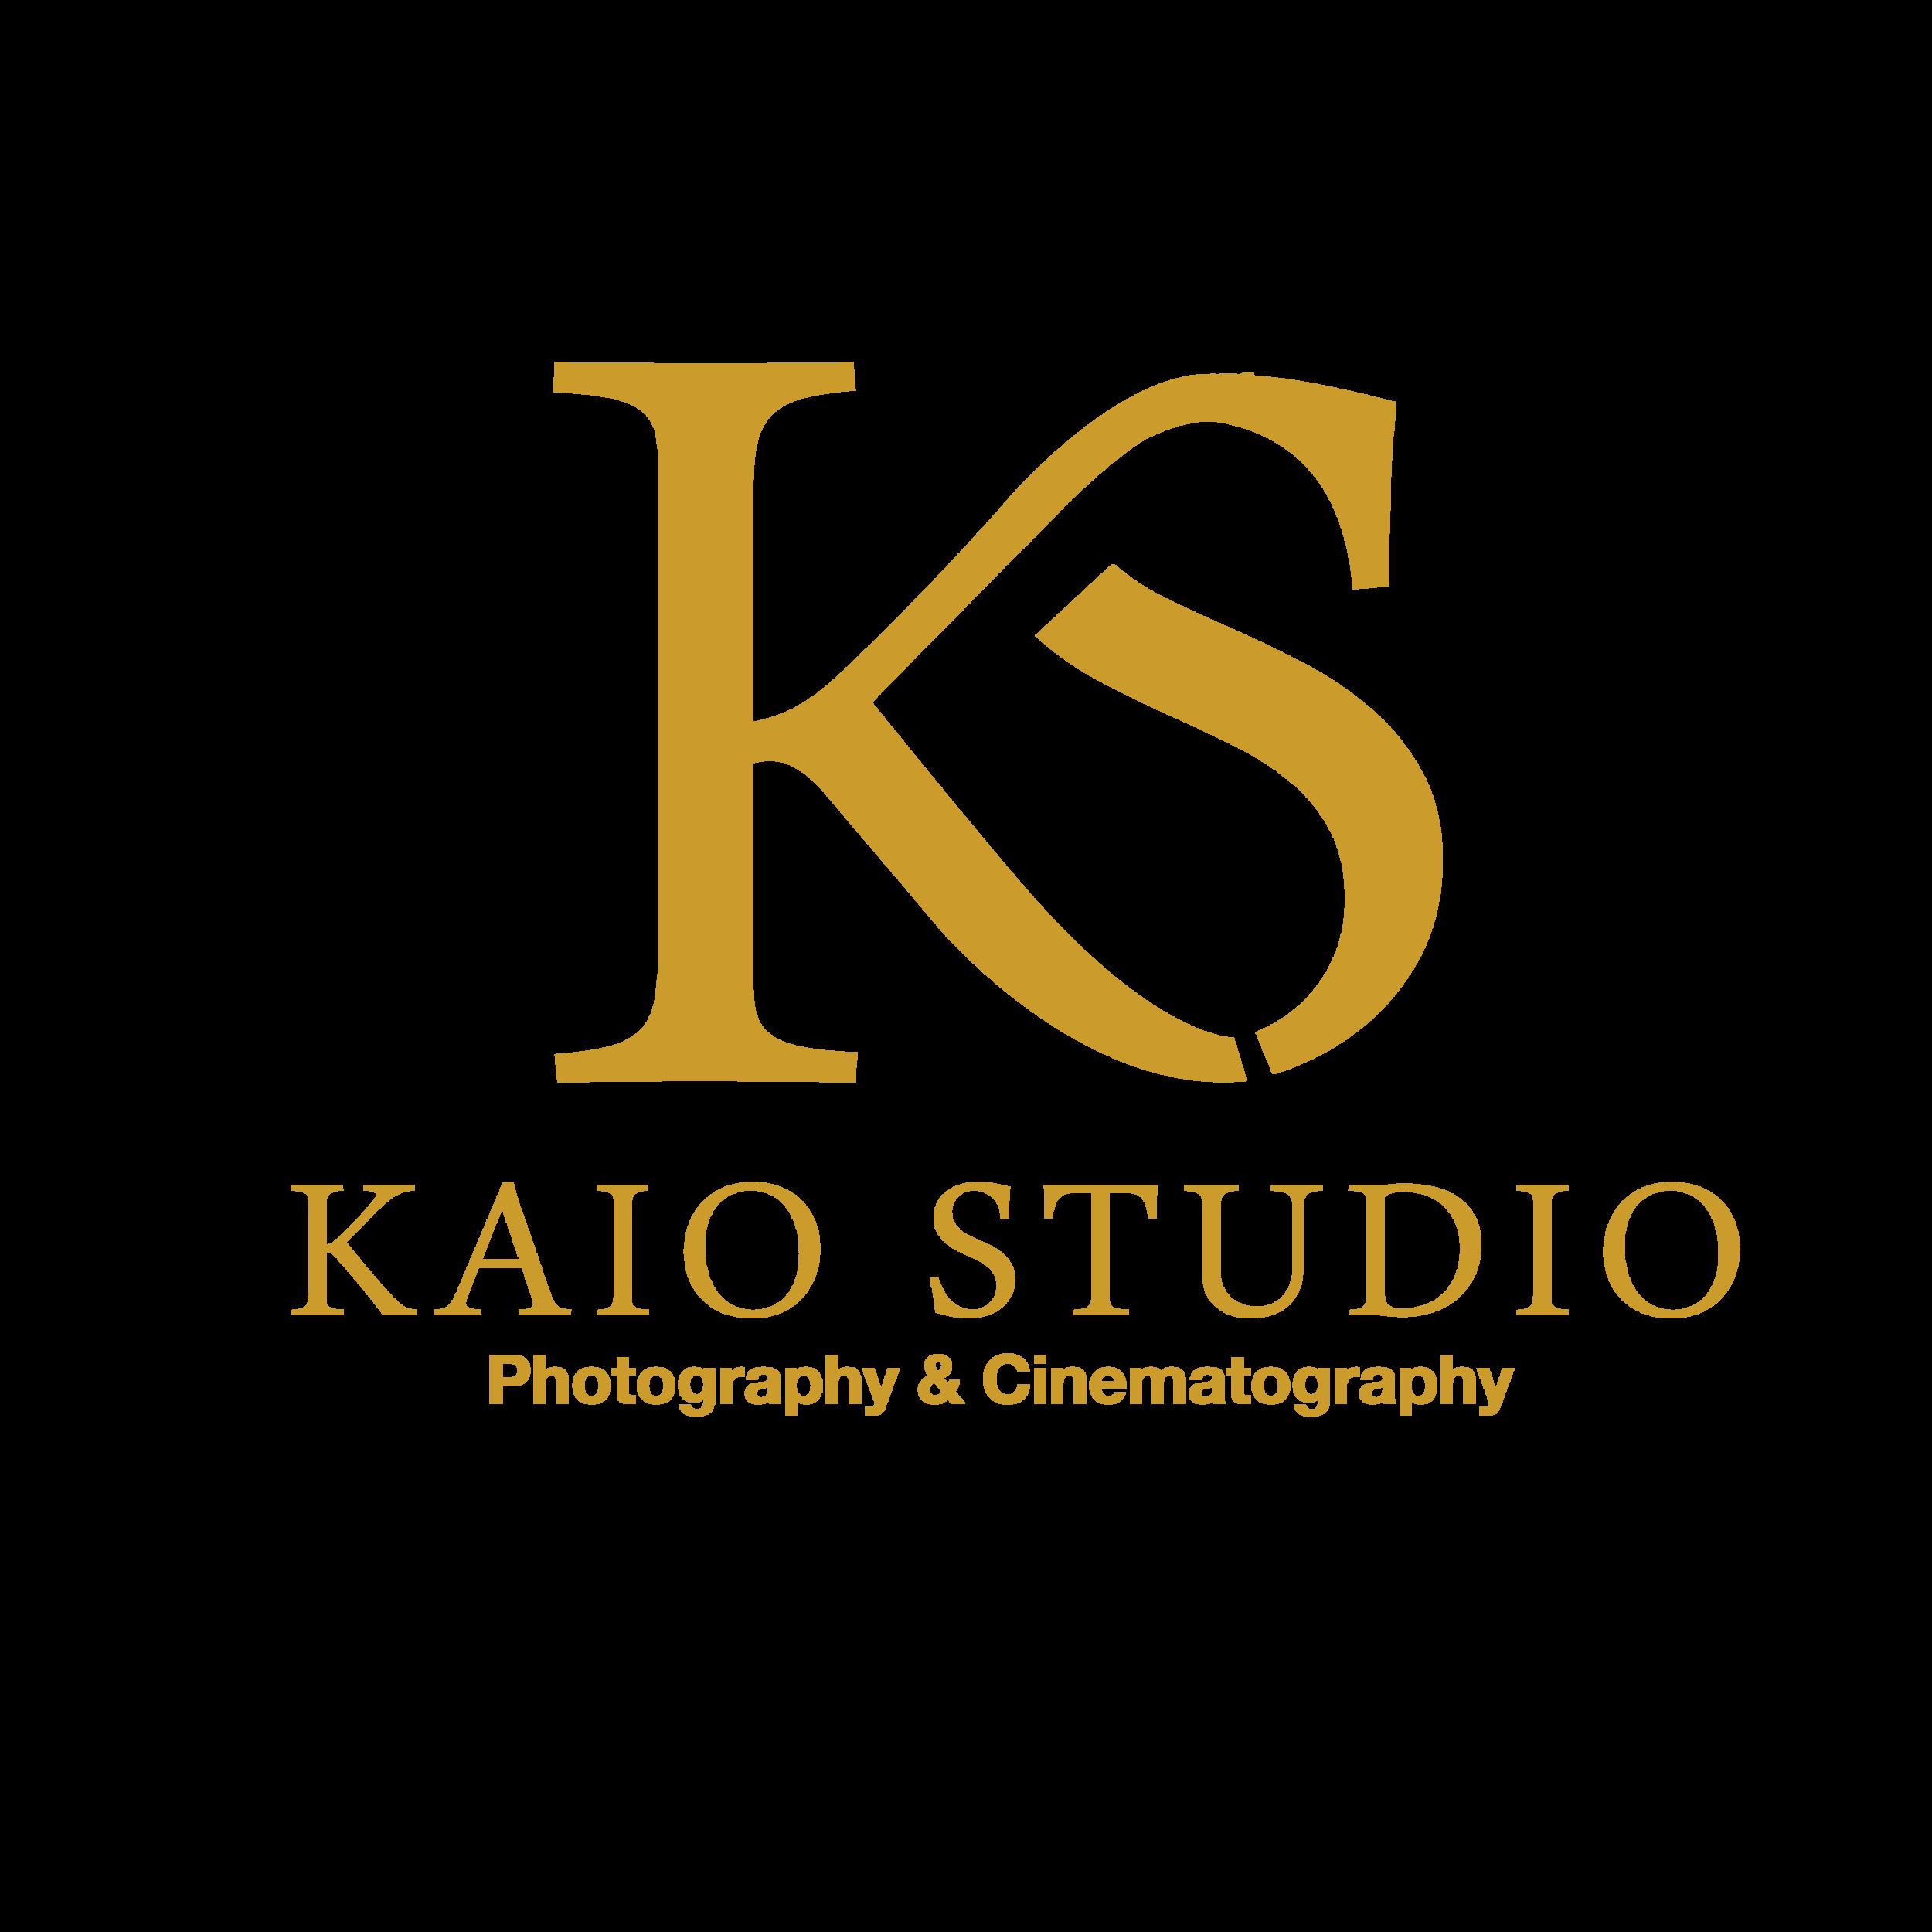 kaio studio logo design-01.png